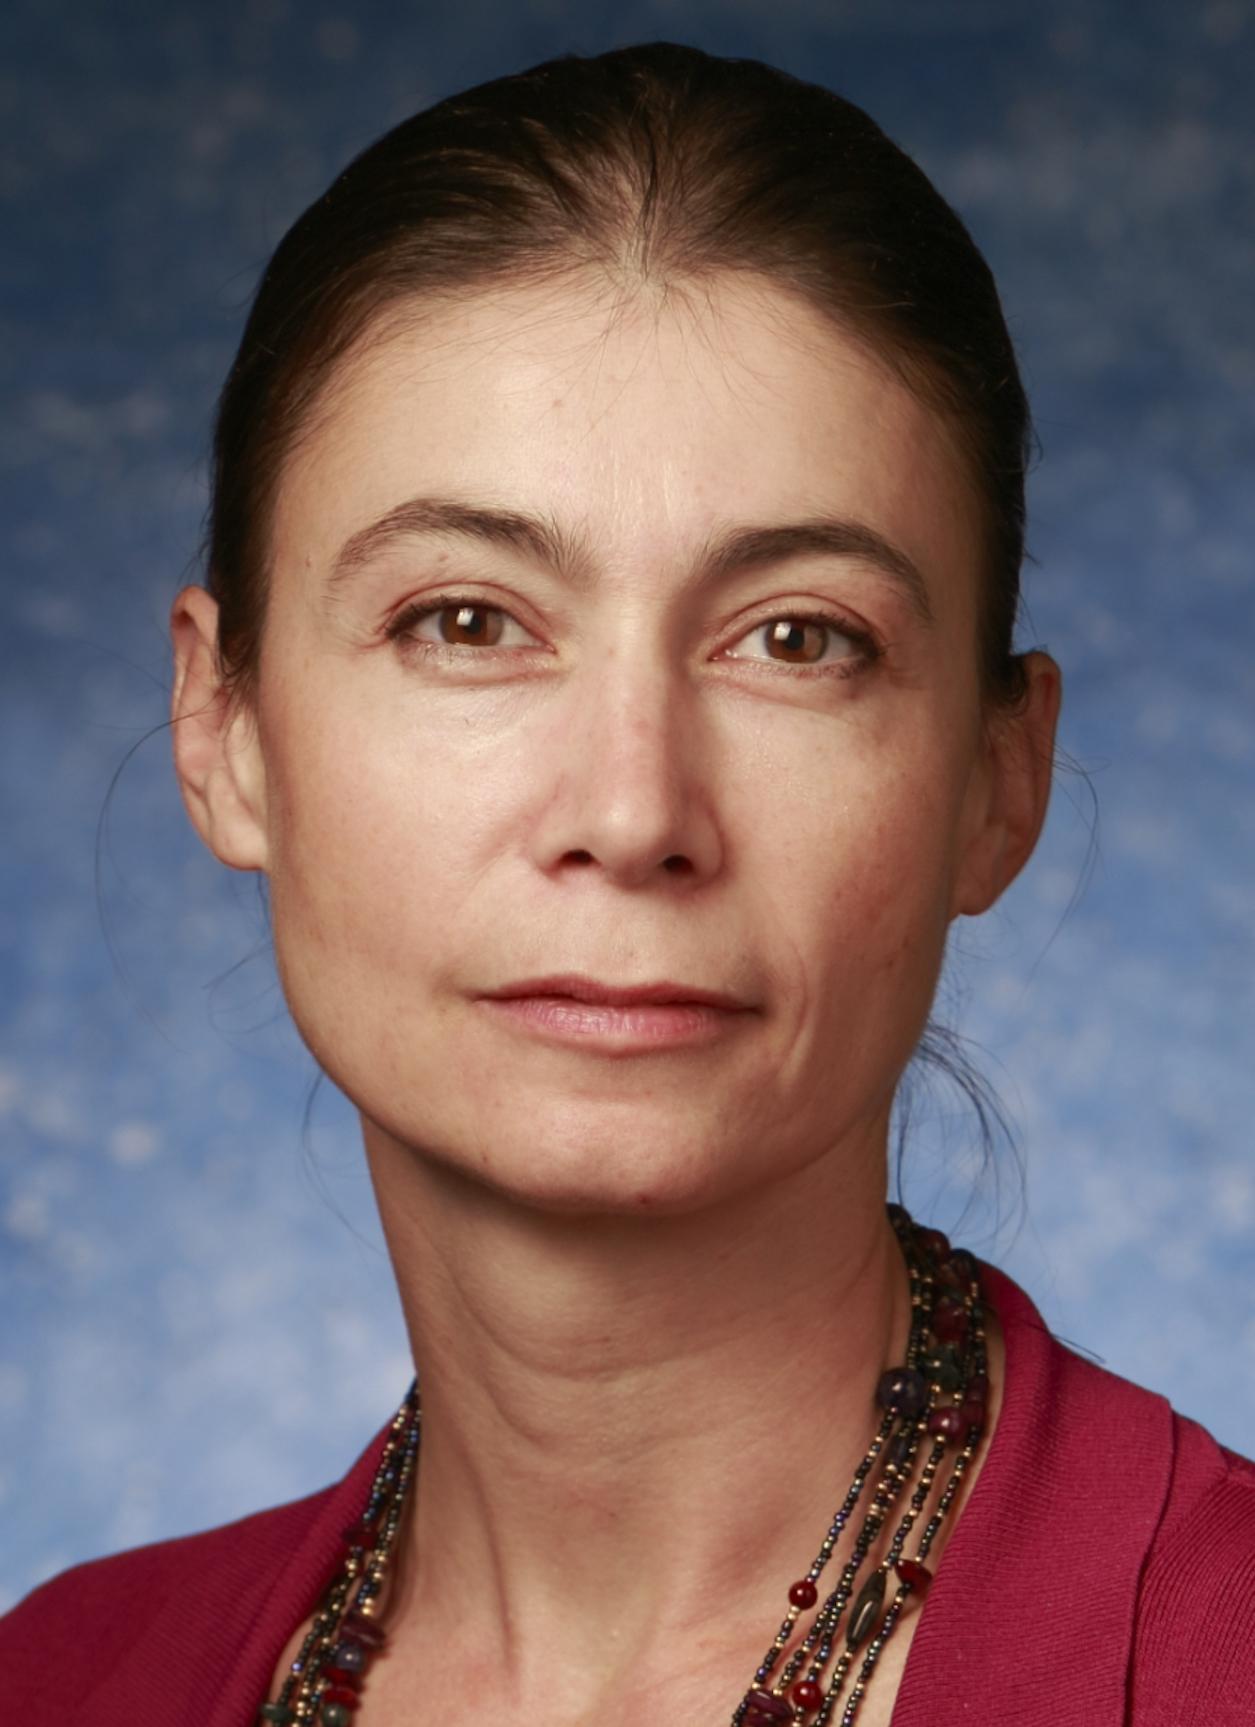 This is a portrait of Dr. Vojislava Pophristic